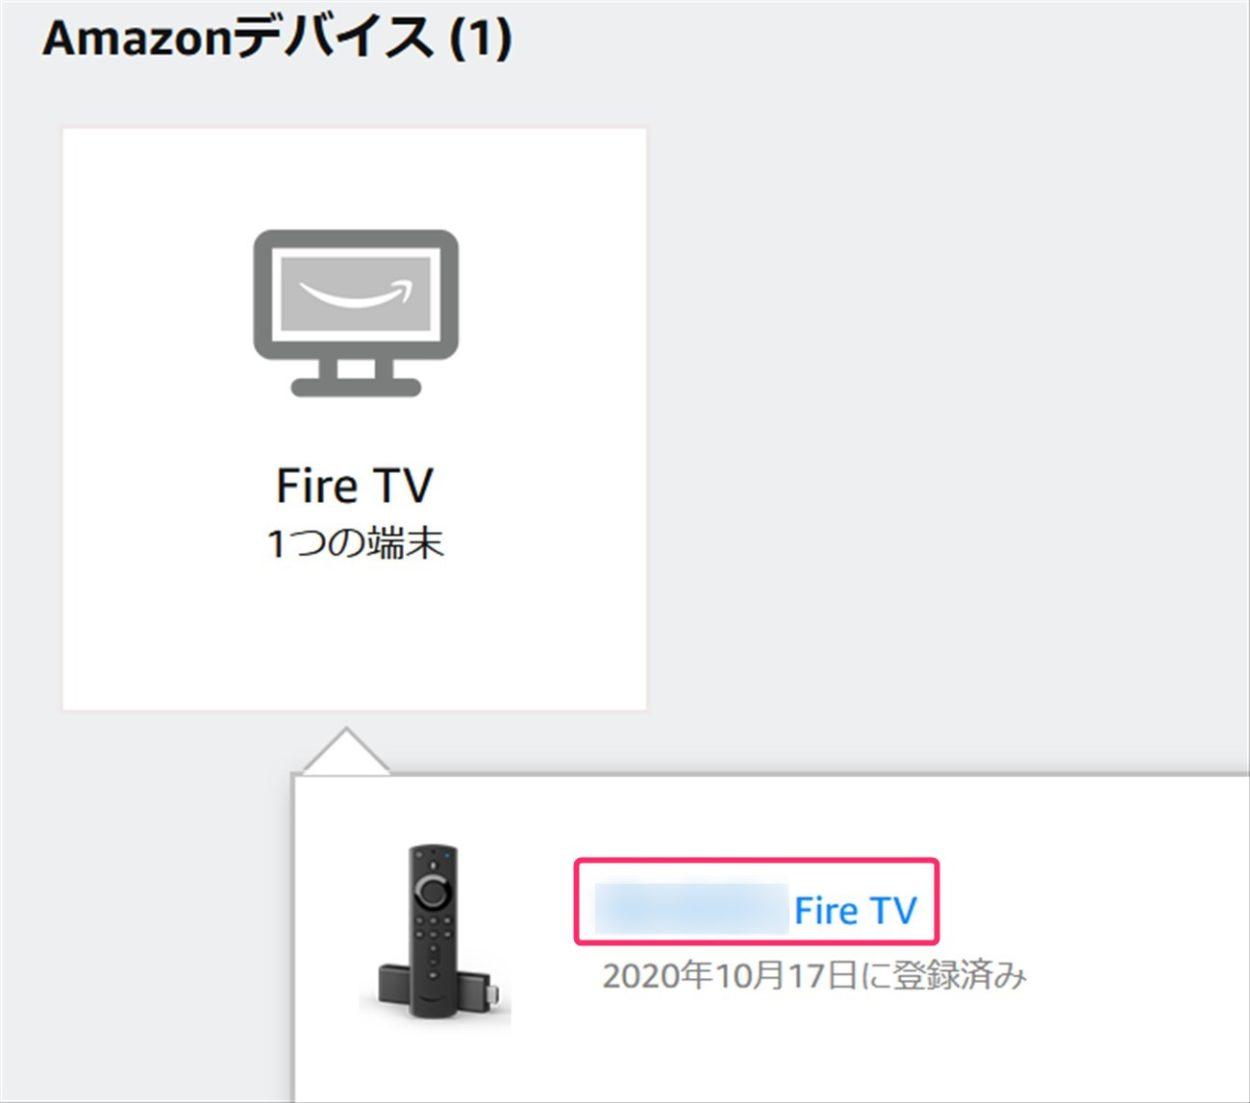 Amazonアカウントに紐付いたFire TV Stick